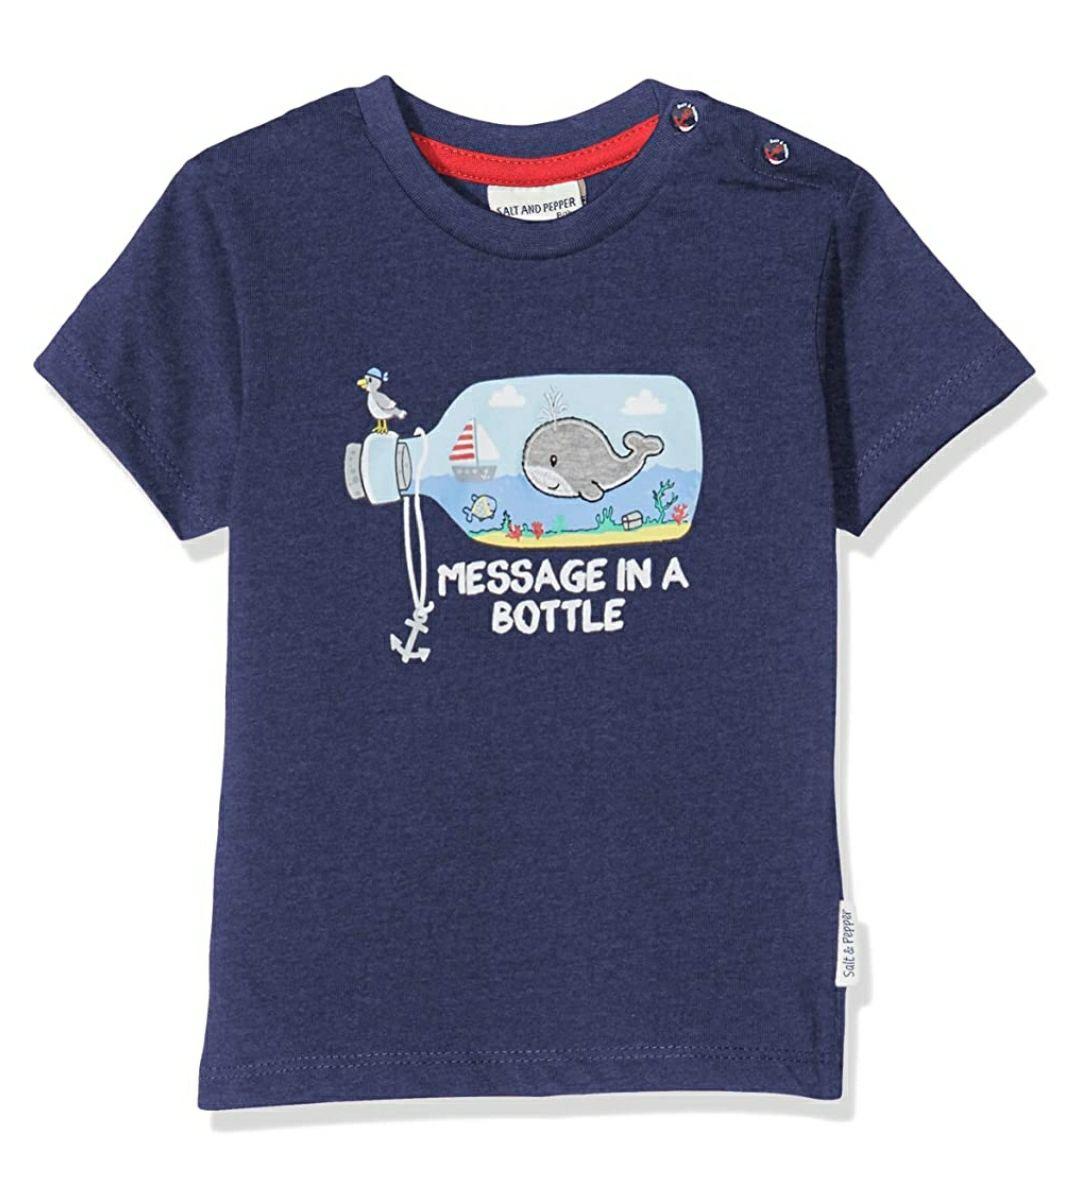 TALLA 62 - Salt & Pepper Mit Maritimen Druck Und Stickerei Camiseta para Bebés. Color azul